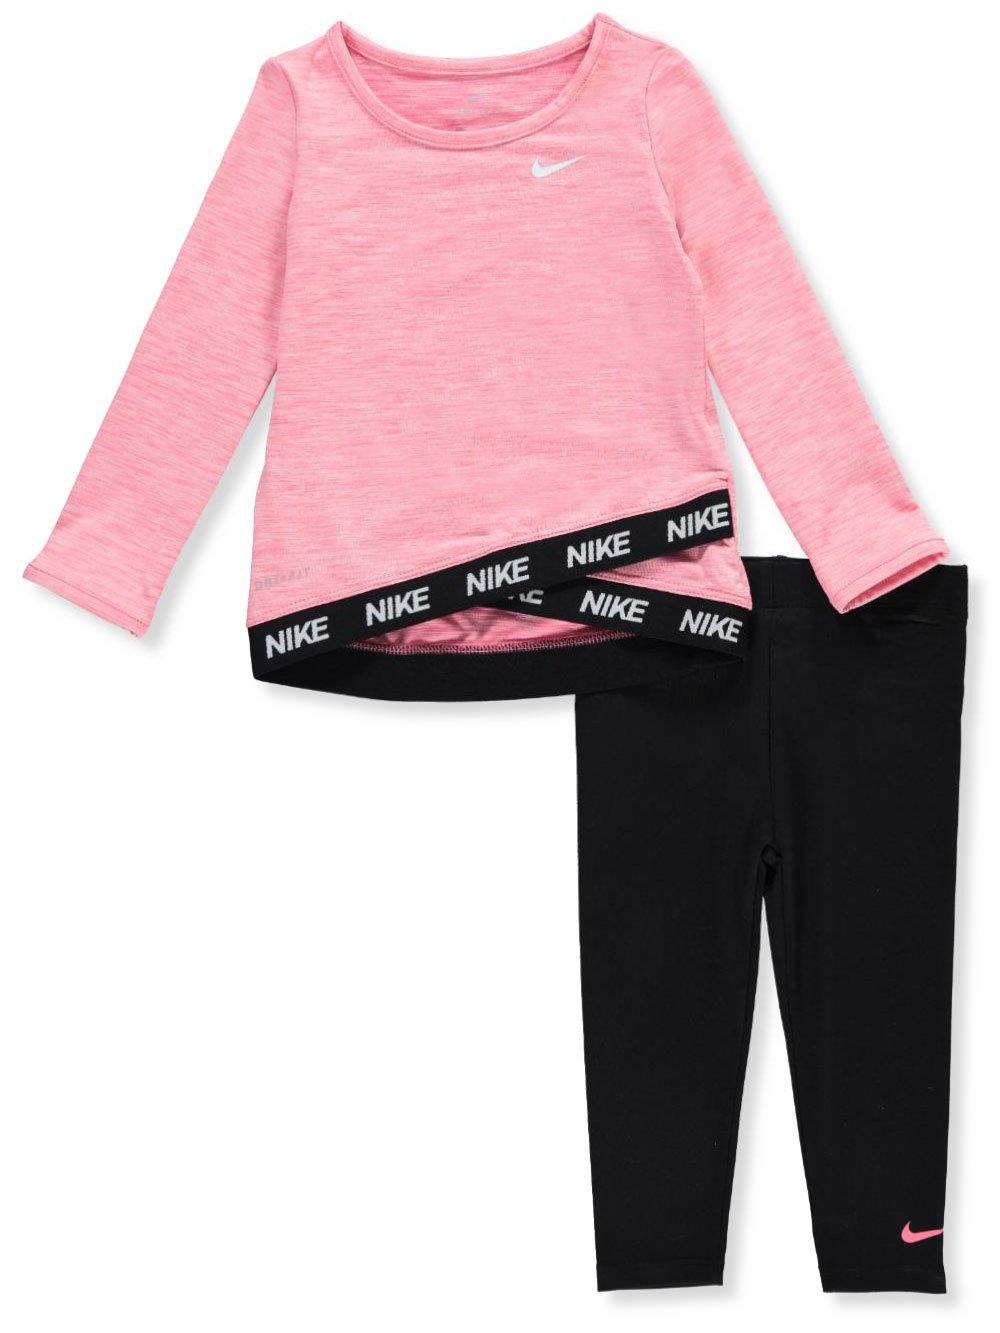 48f3dfe520beb NIKE Baby Girls' 2-Piece Dri-Fit Leggings Set Outfit - Black, 18 Months:  Amazon.co.uk: Sports & Outdoors